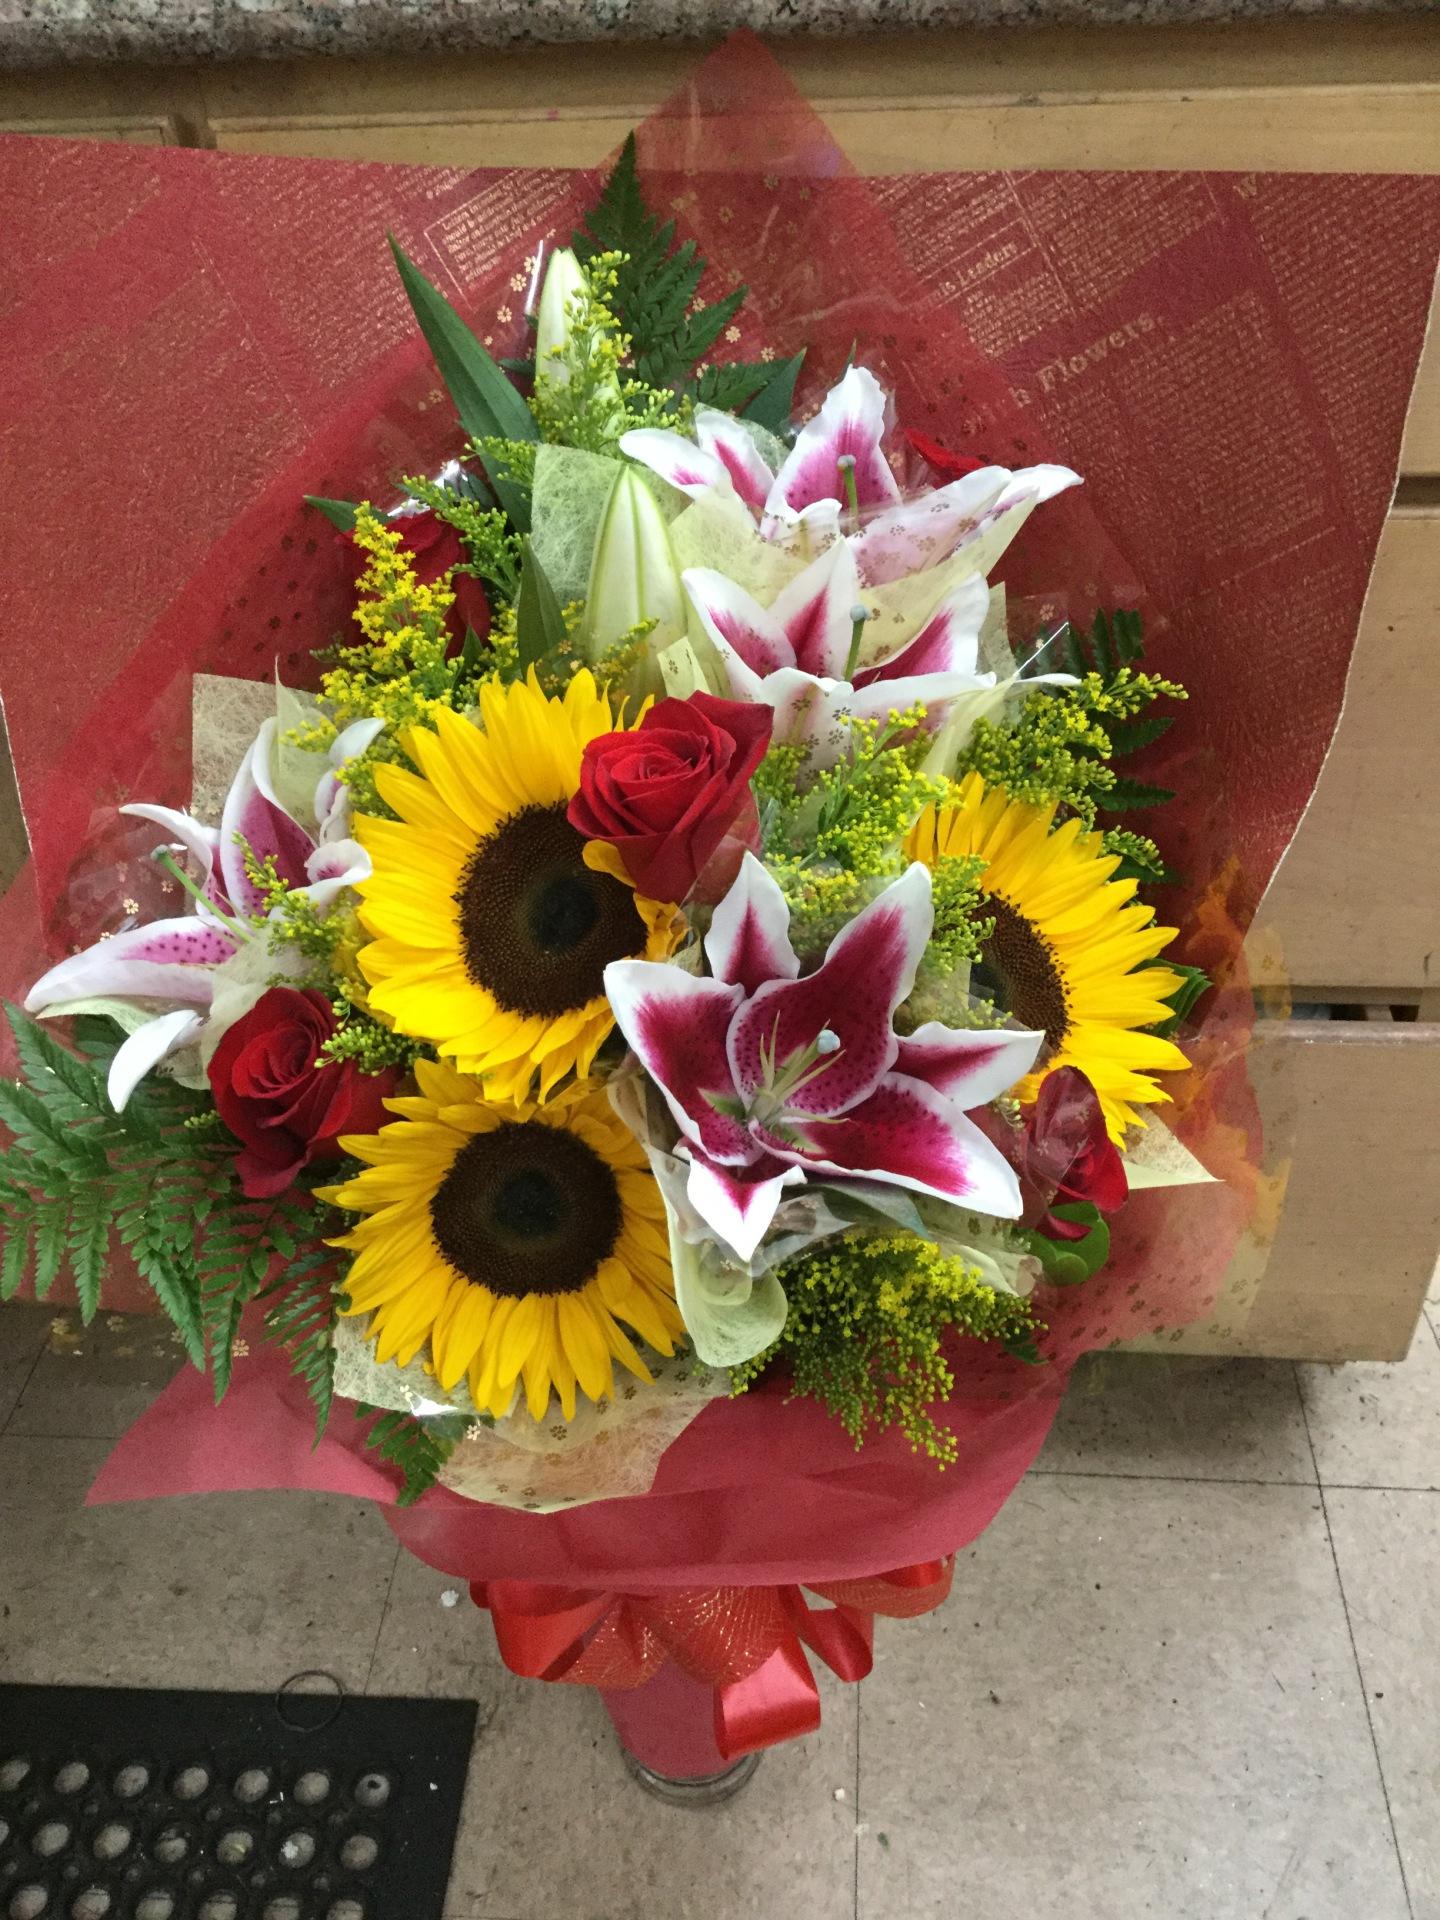 Lily & Sunflower Wrap Bouquet